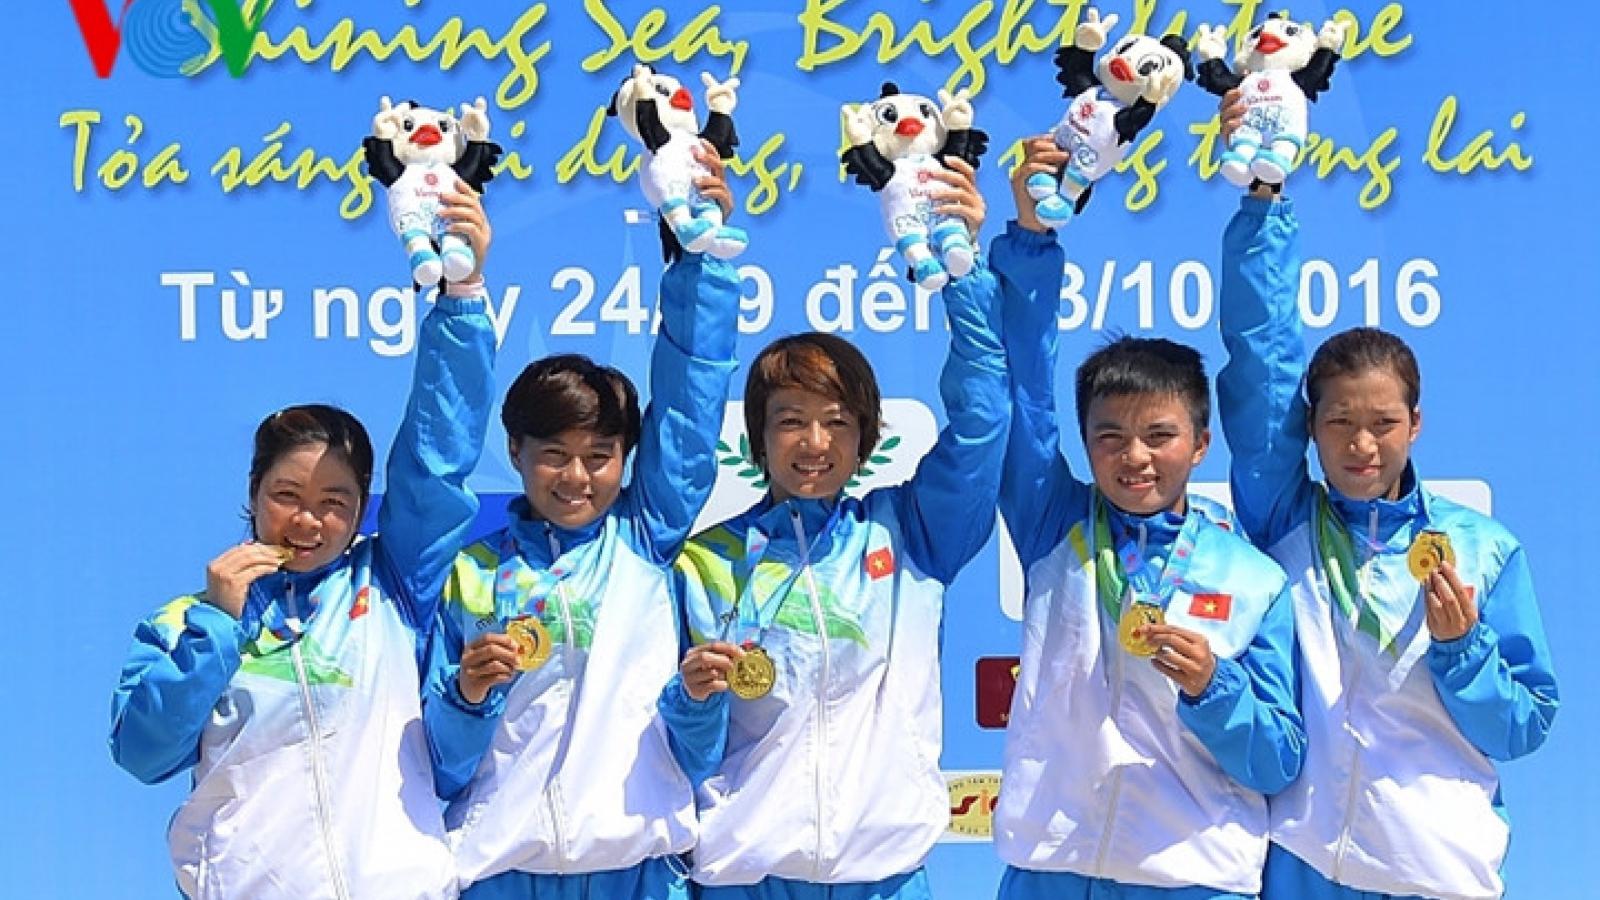 Vietnam sepak takraw team wins gold at ABG5